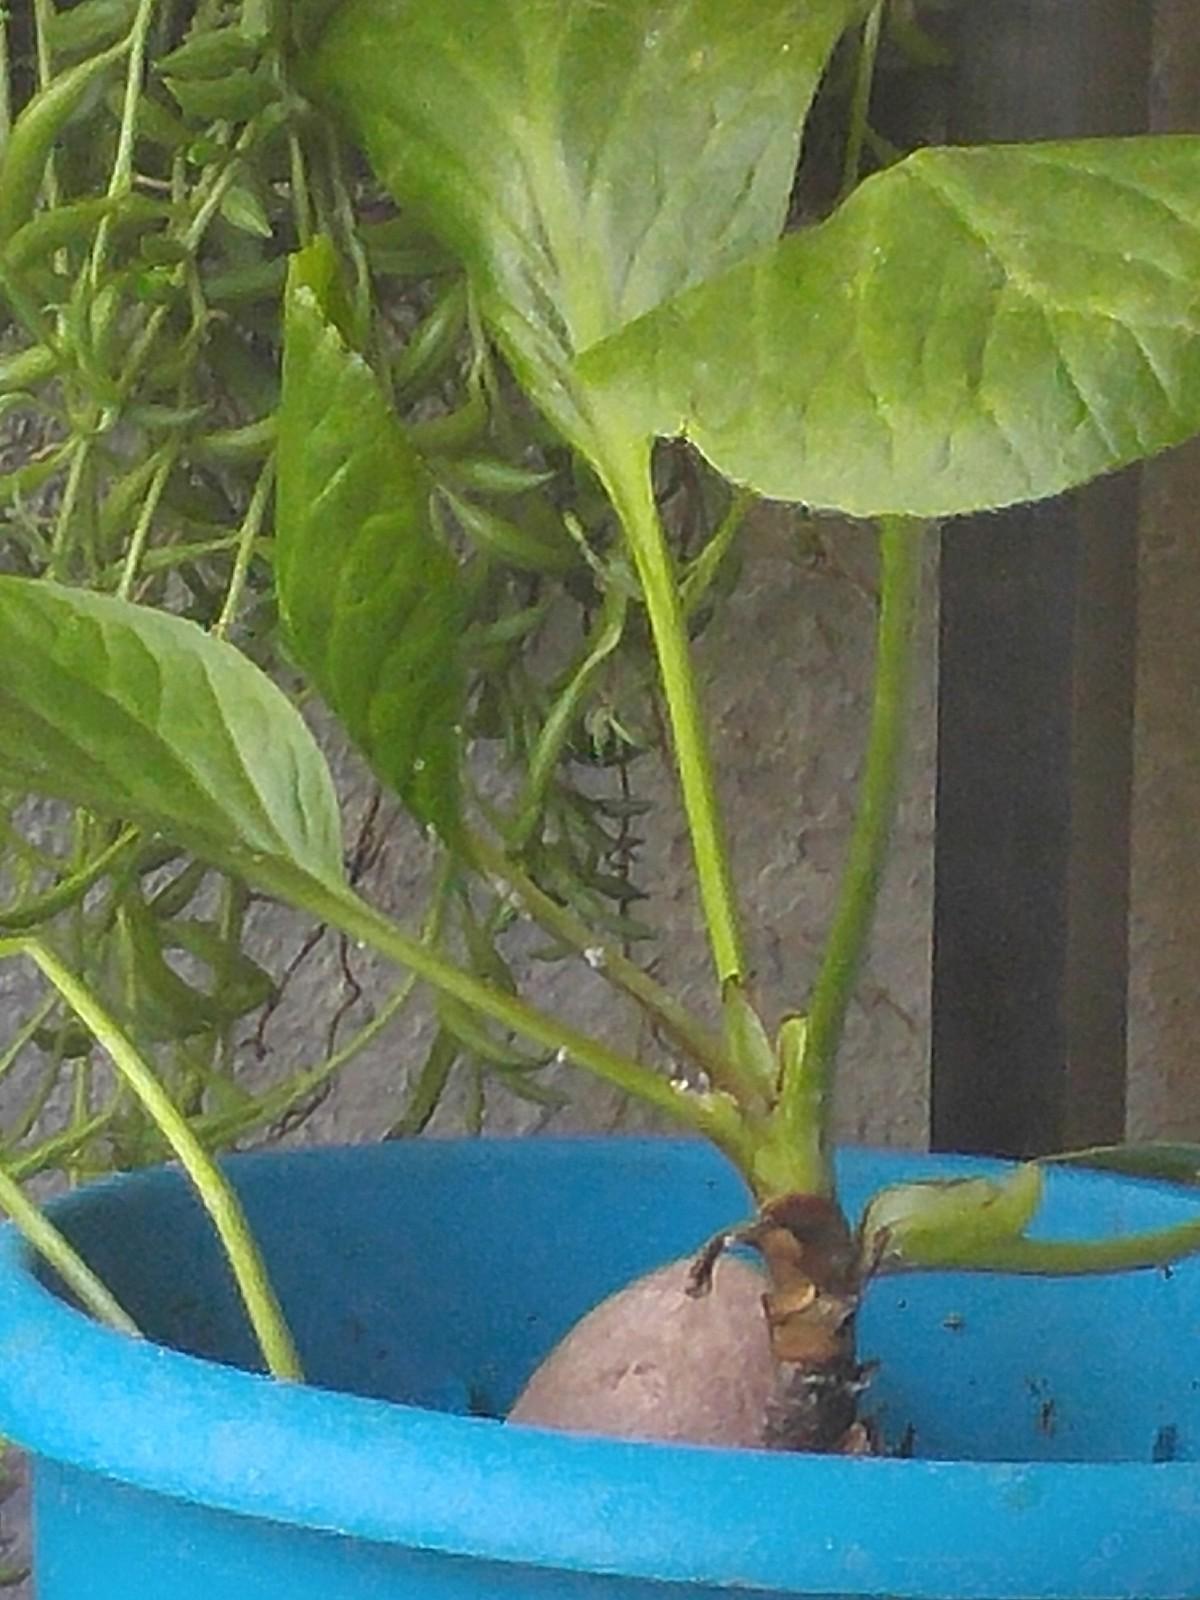 Peace lily spathiphyllum cochlearispathum mygarden photo peace lily izmirmasajfo